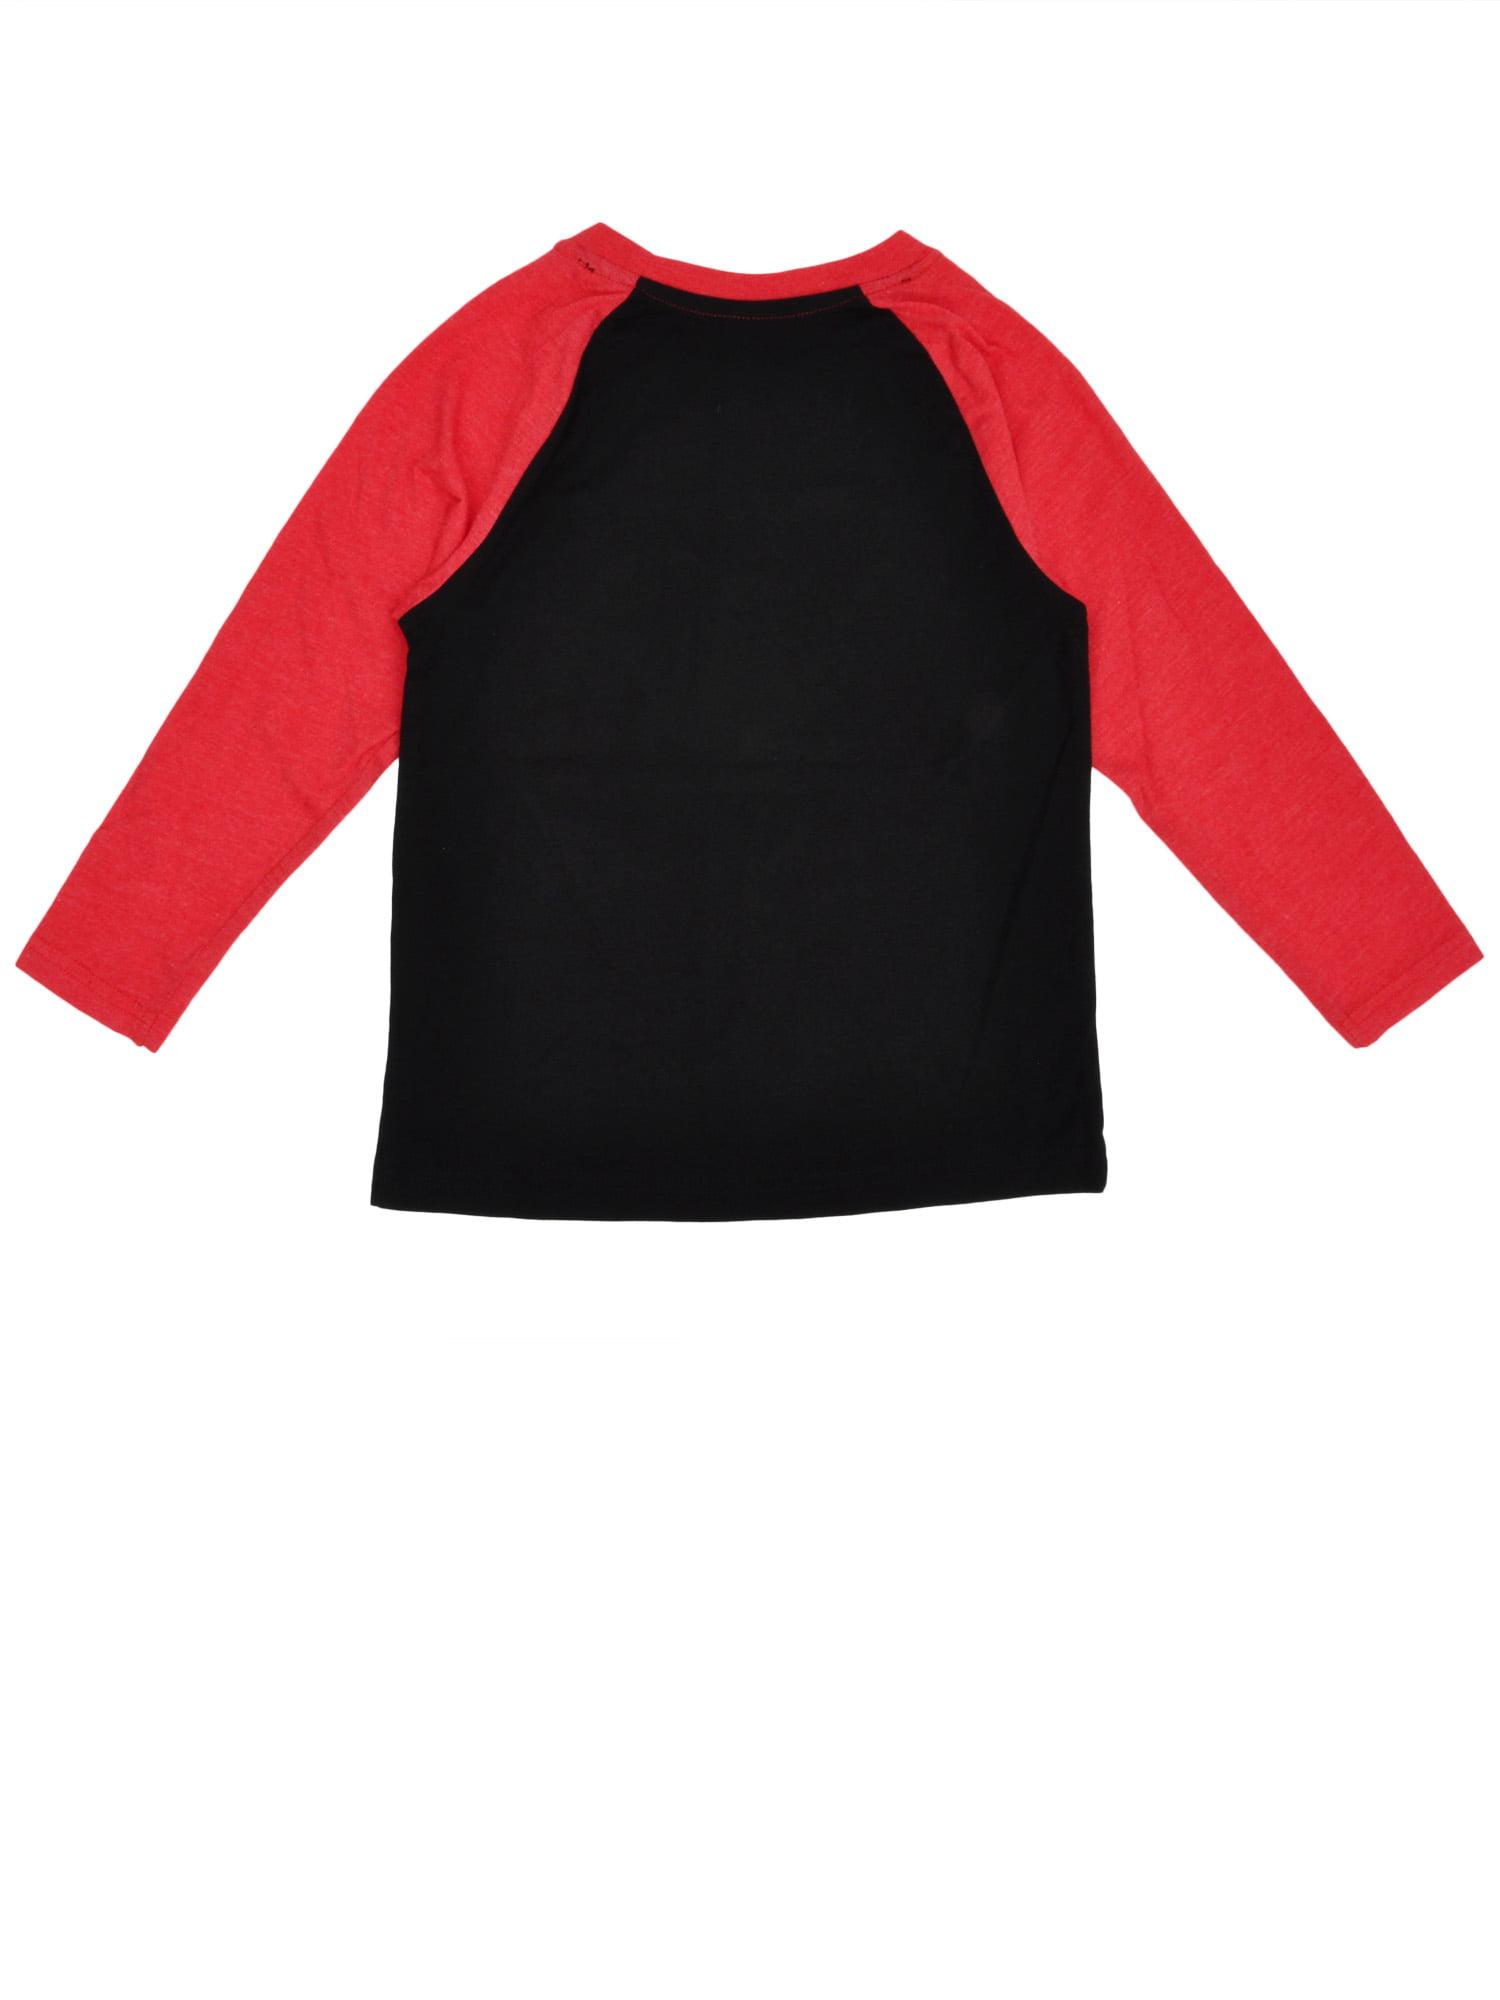 Warm Winter top Underwear T407 American Apparel Baby thermal long sleeve tee